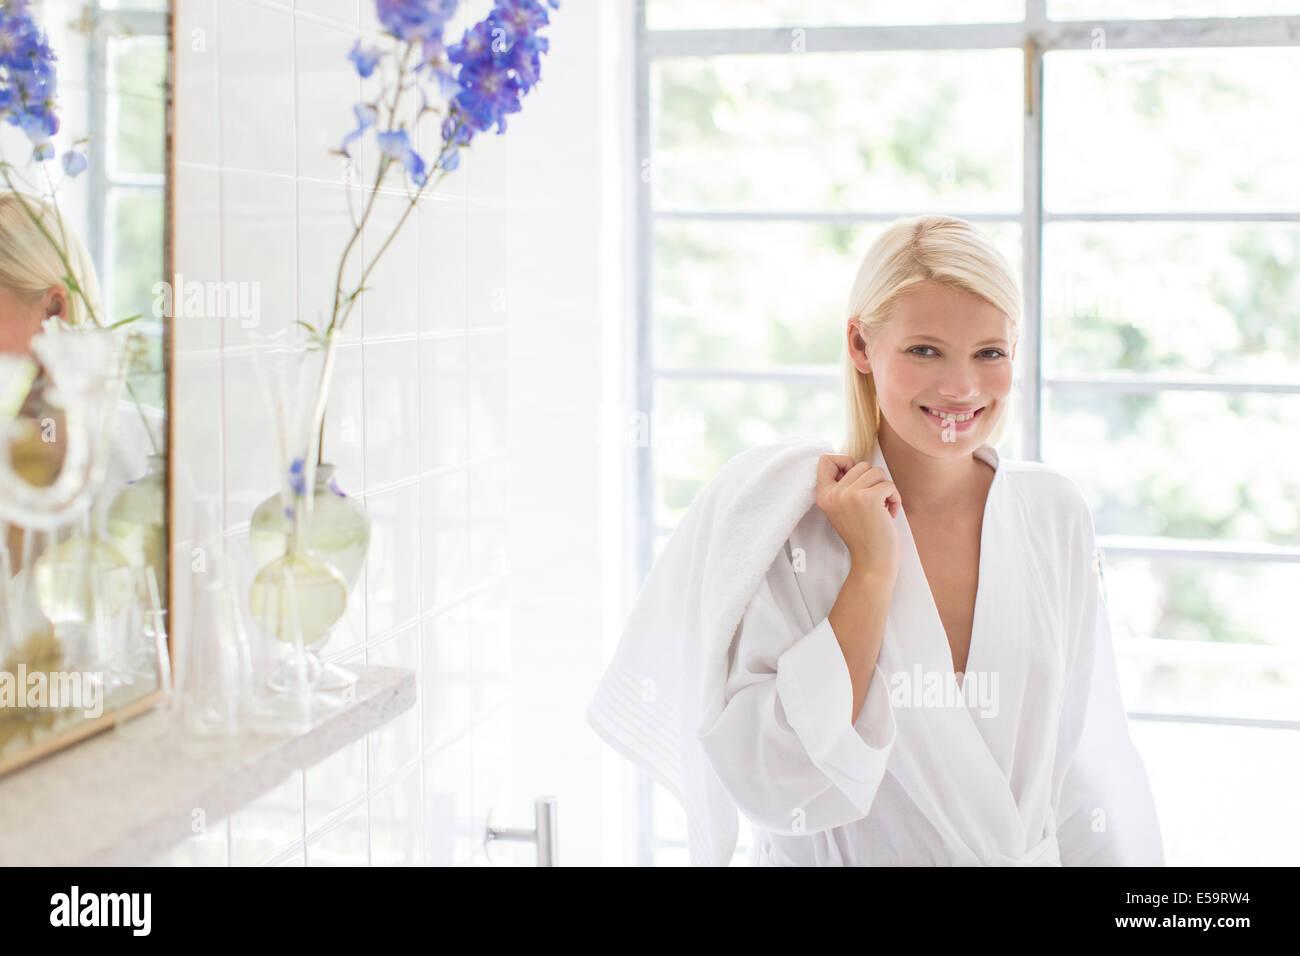 Woman in bathrobe smiling in bathroom Photo Stock